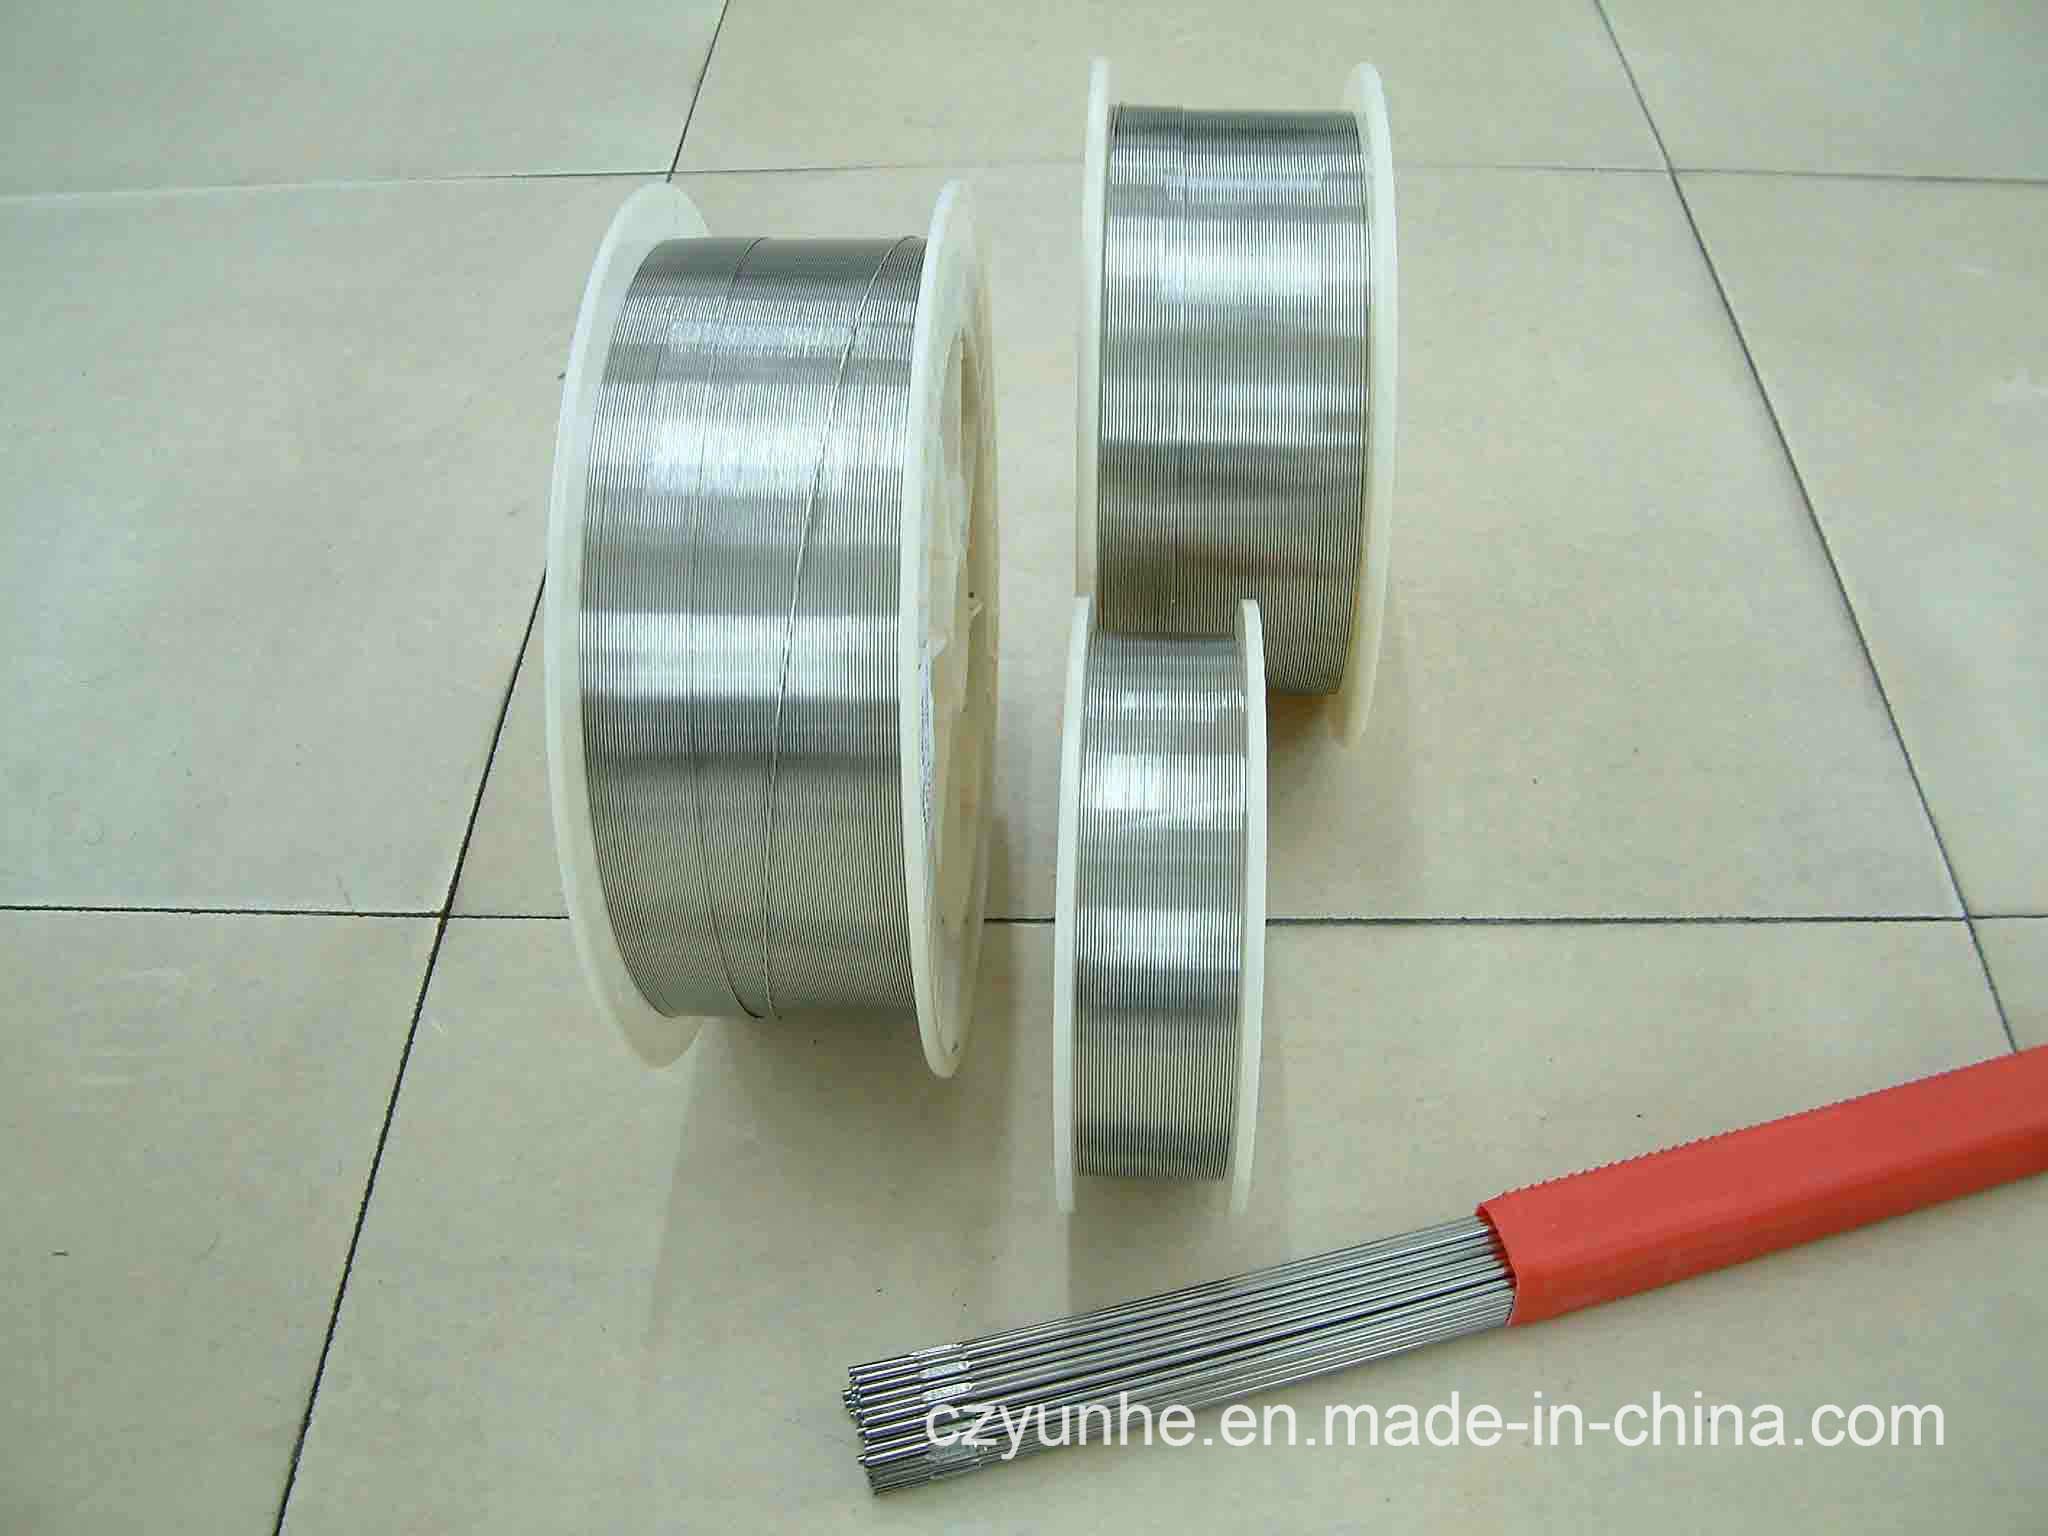 China Stainless Steel Welding Wire (ER308L, ER308LSi, ER309L ...